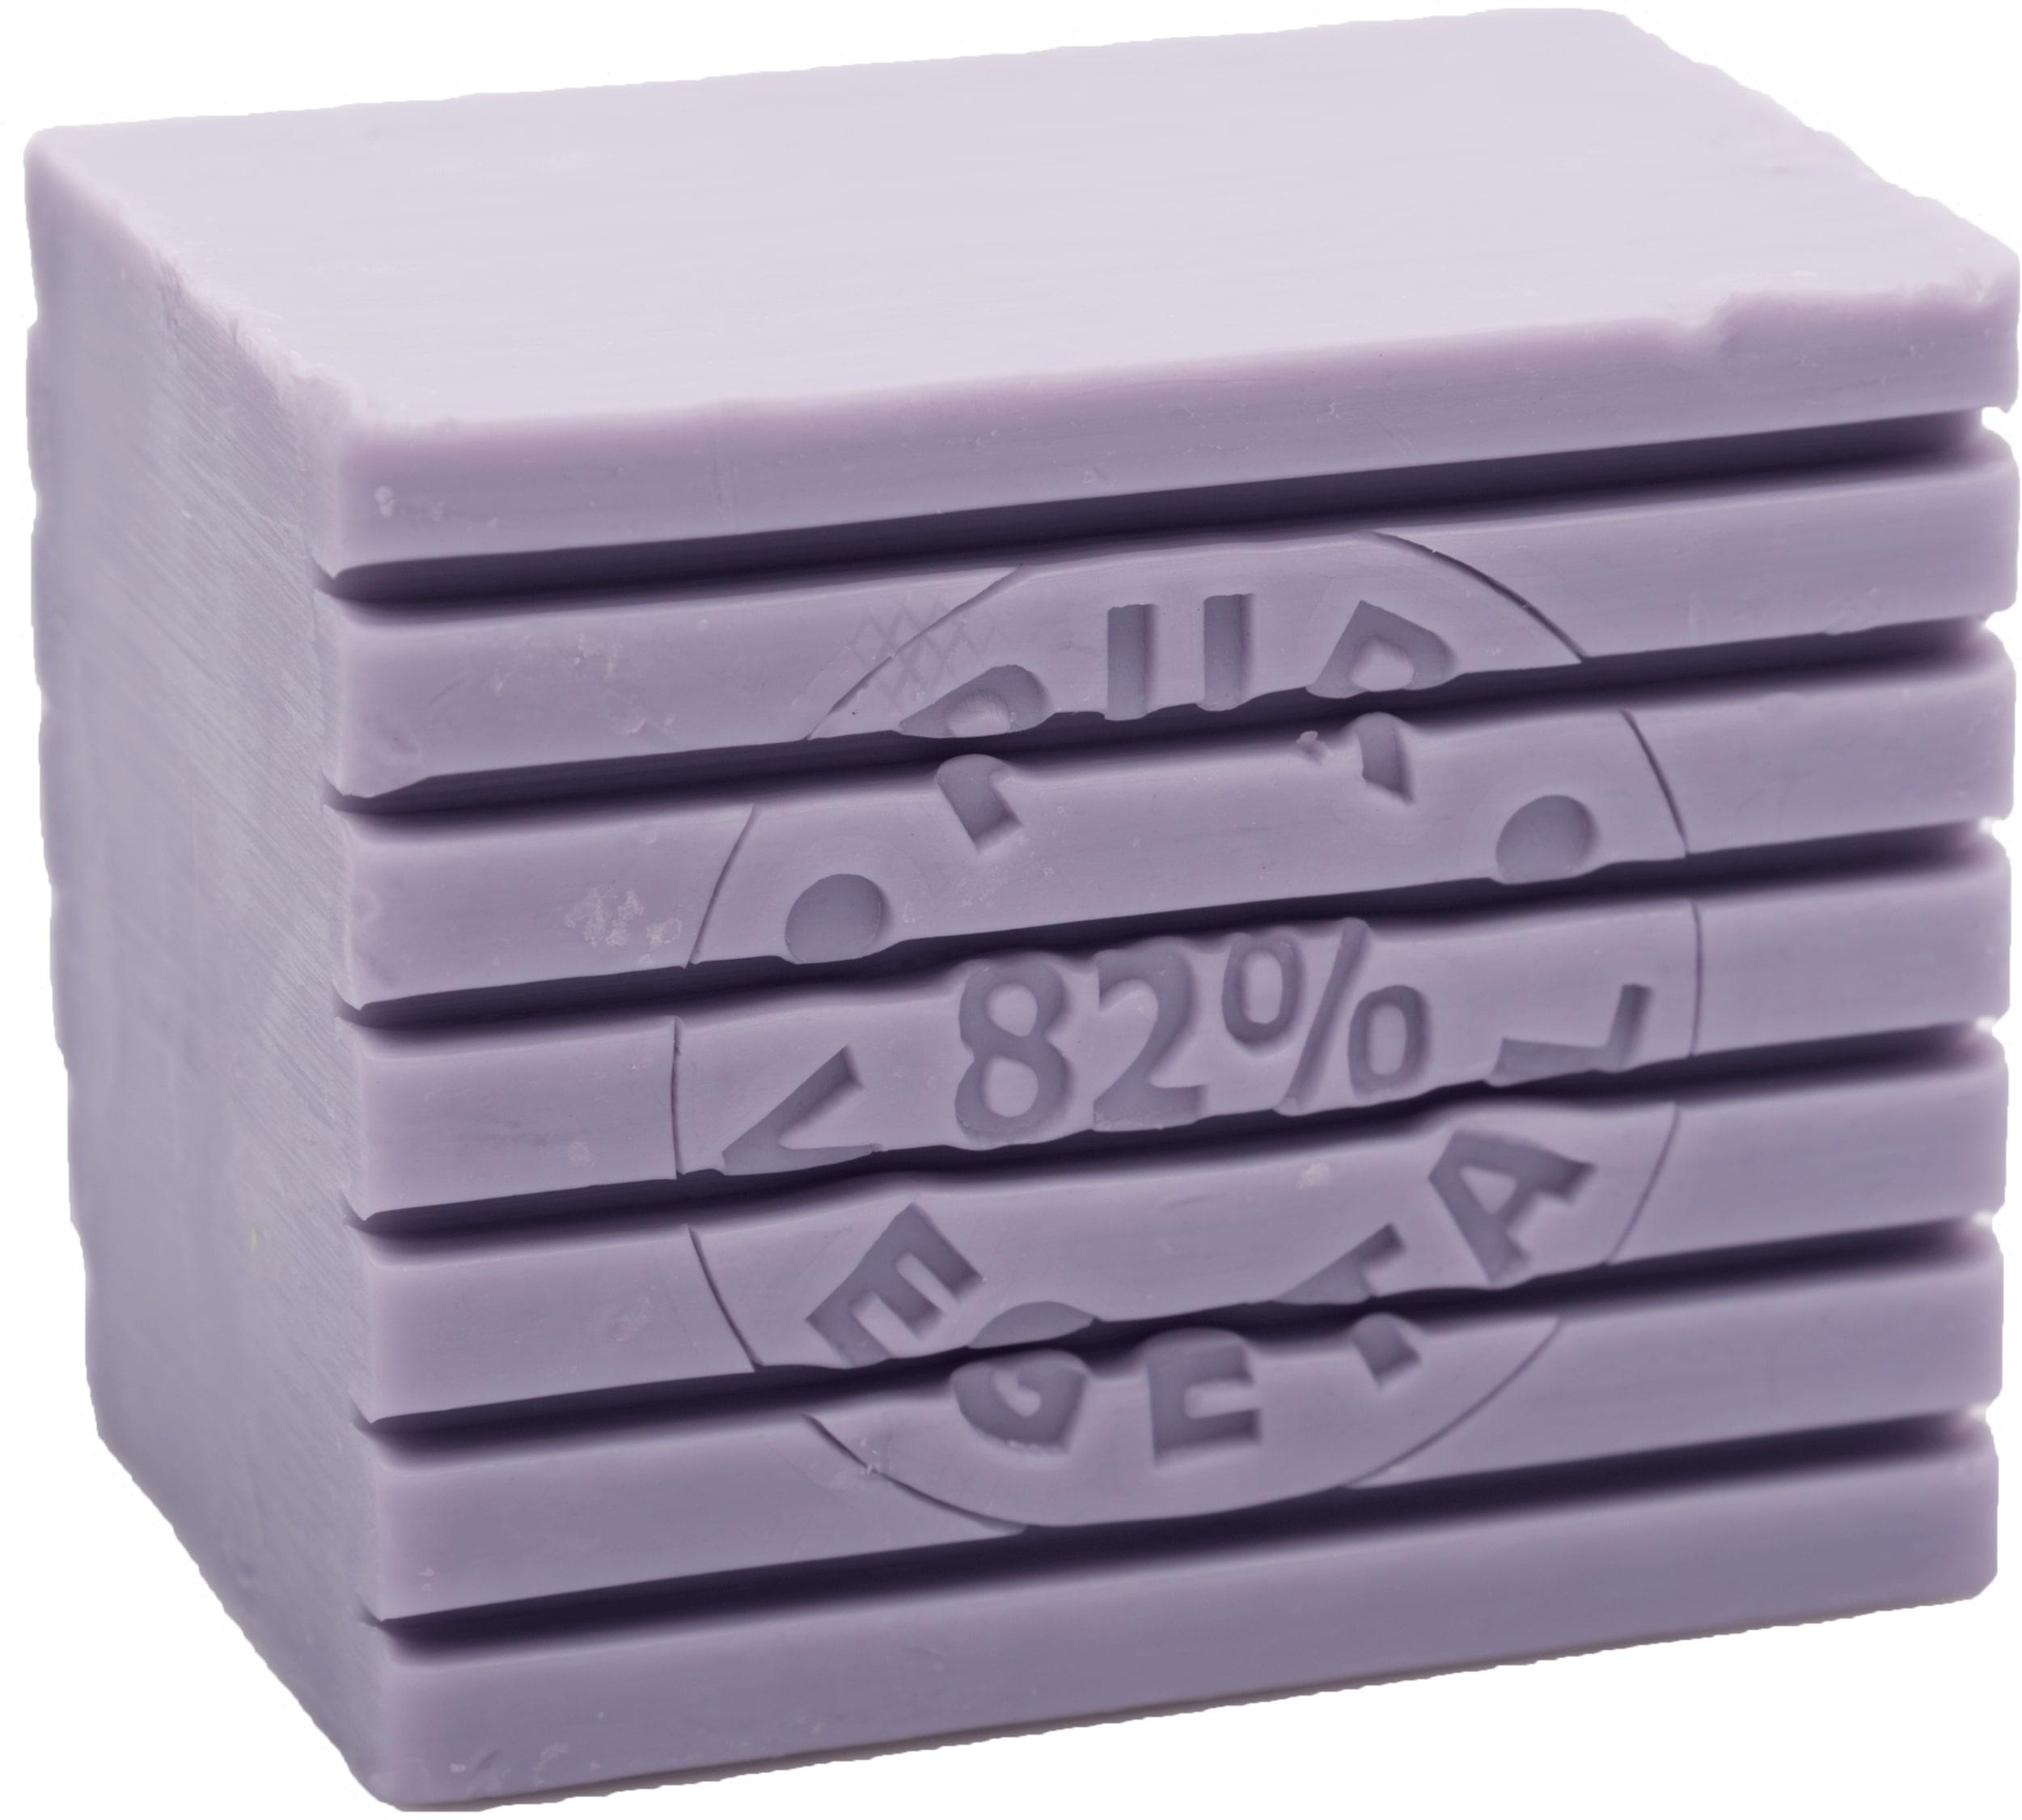 Marseille Seife 300g - Lavendel